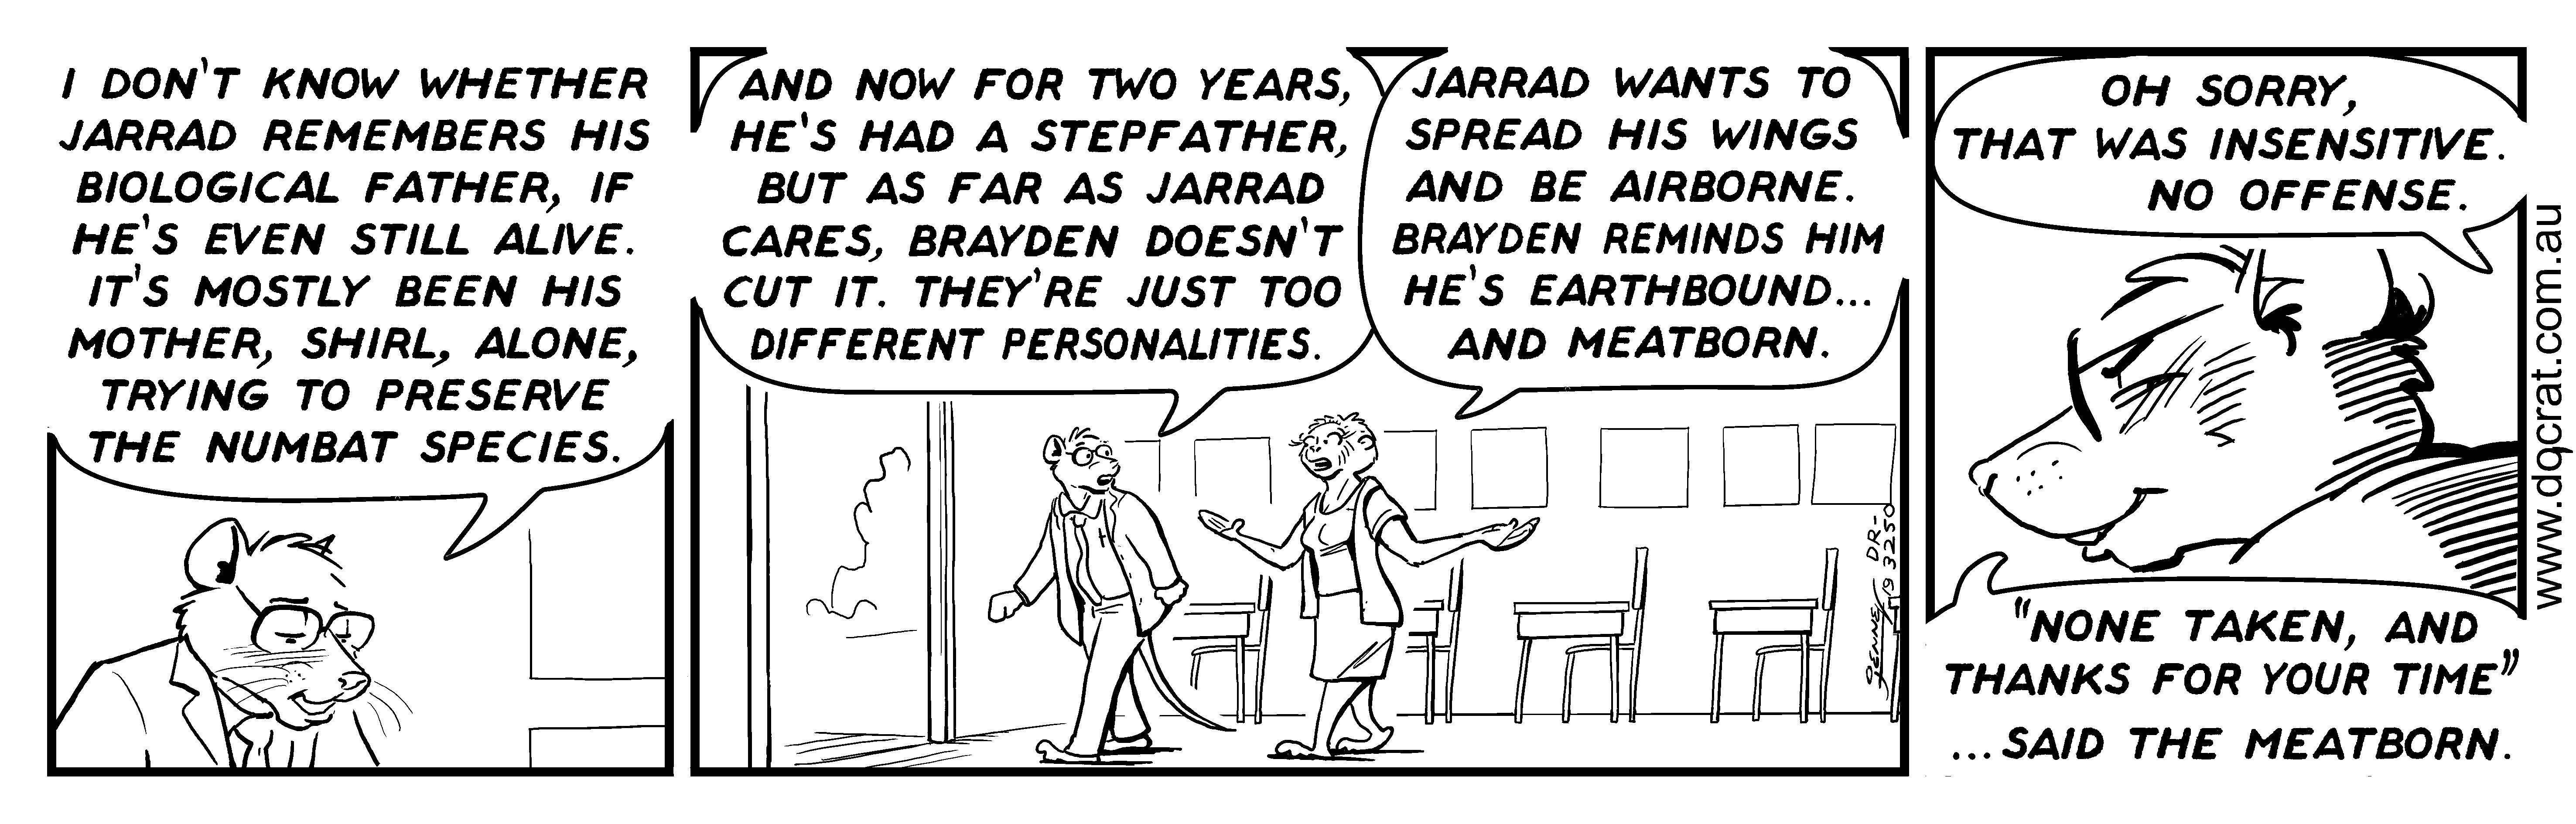 20190524